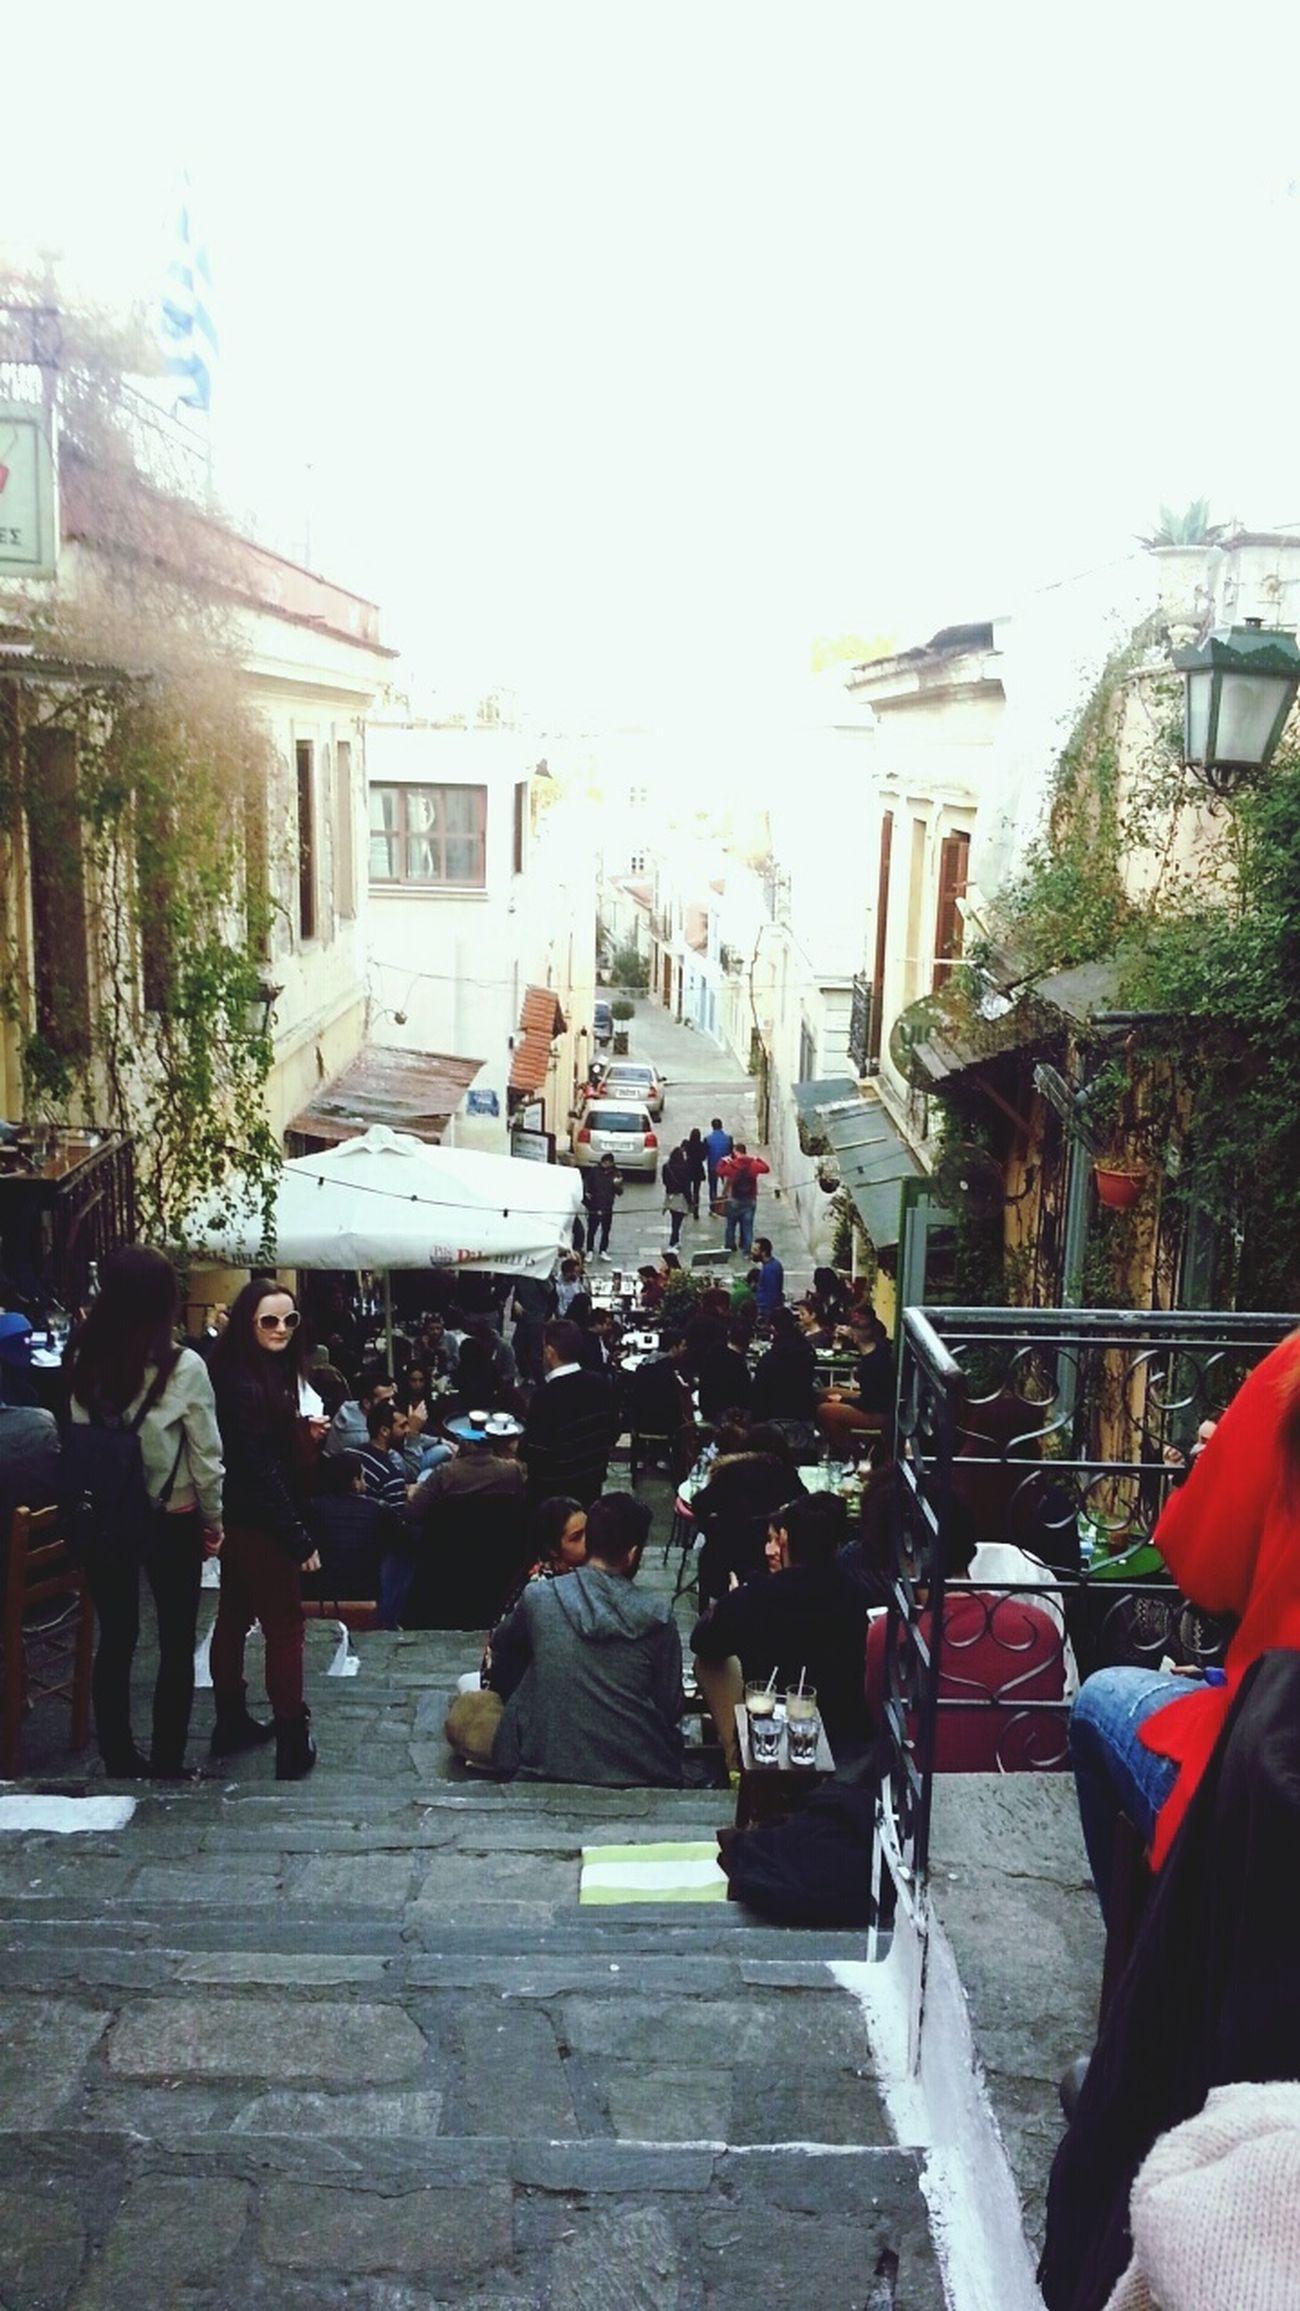 Photooftheday Relaxing Hanging Out Igers Igathens Igersgreece VSCO Vscocam Sunny Day Plaka, Athens Giasemi